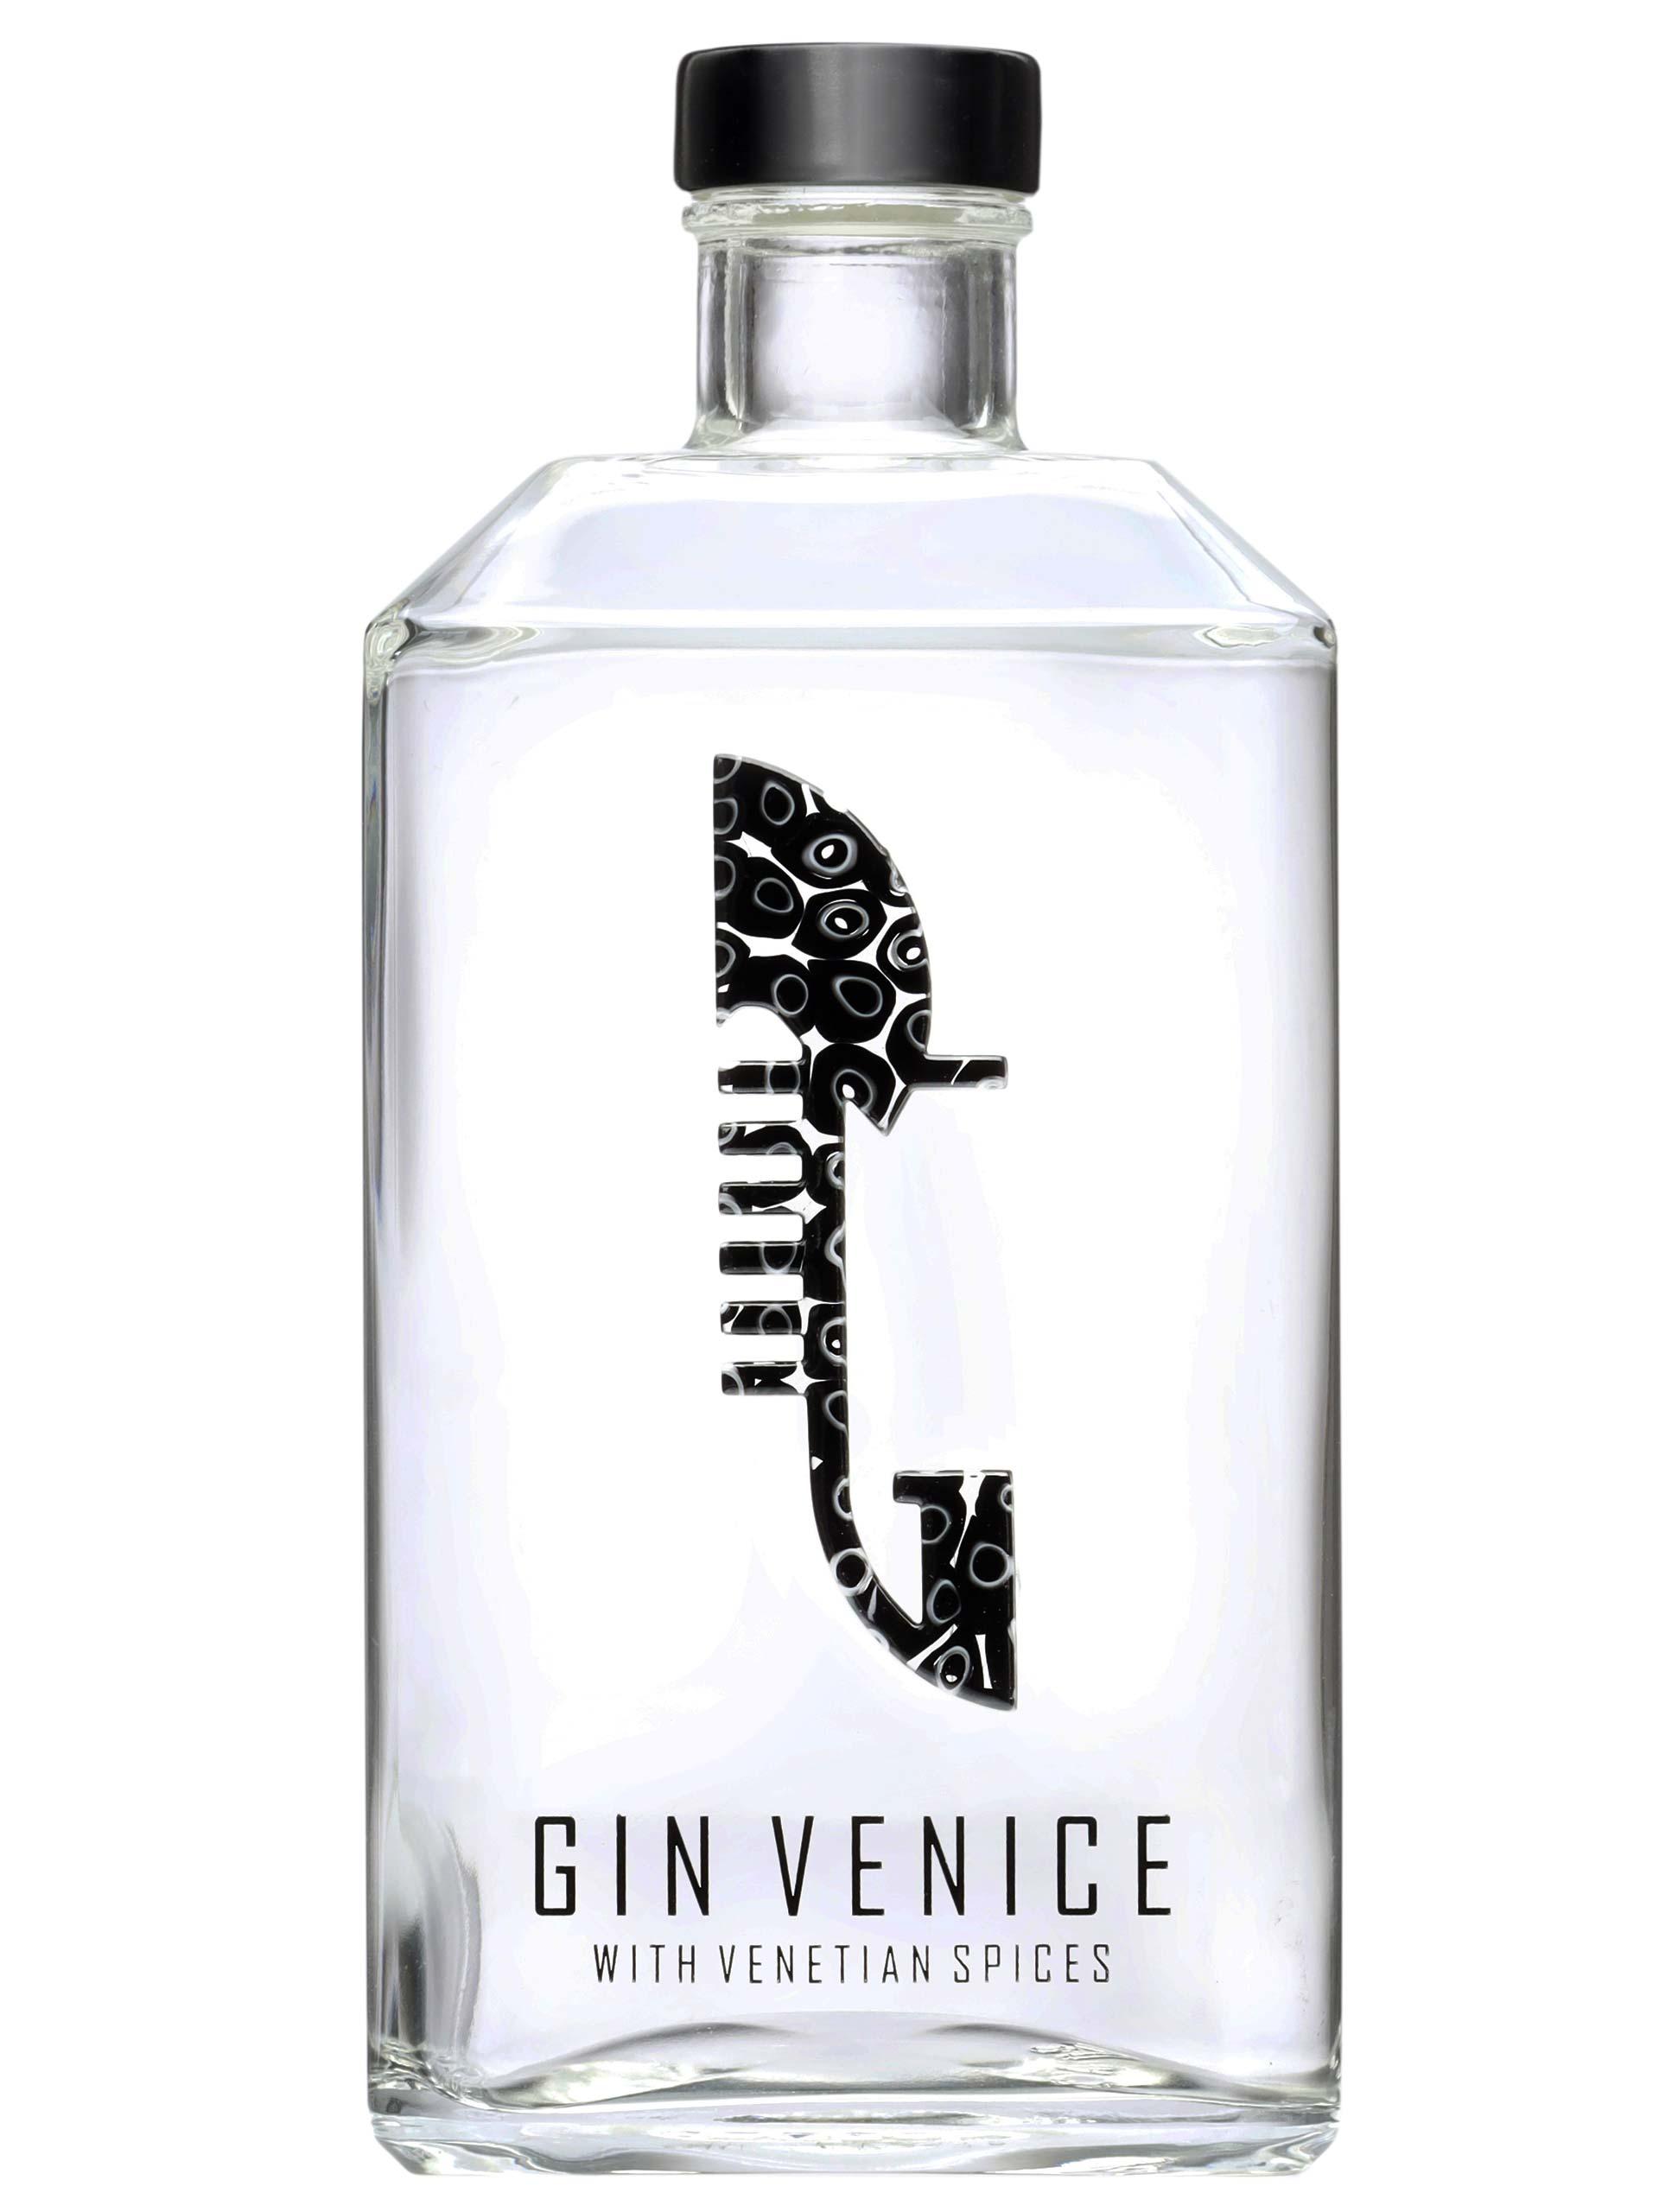 Gin Venice - Bottiglia Gin Venice - Vendita Gin Venice